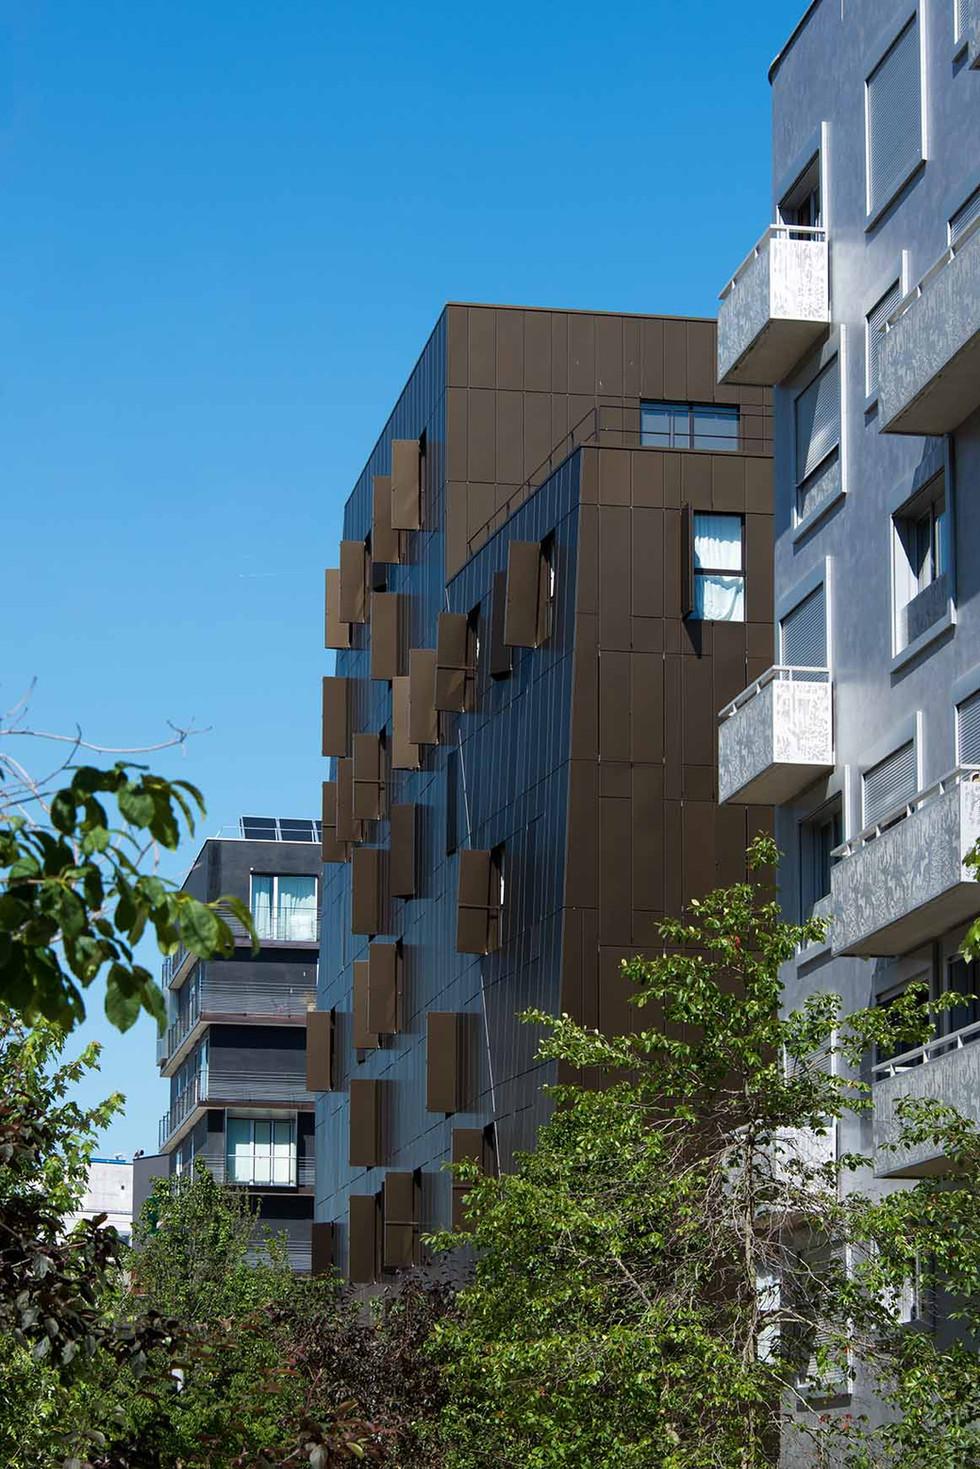 Monolithe, Boulogne Billancourt_02.JPG